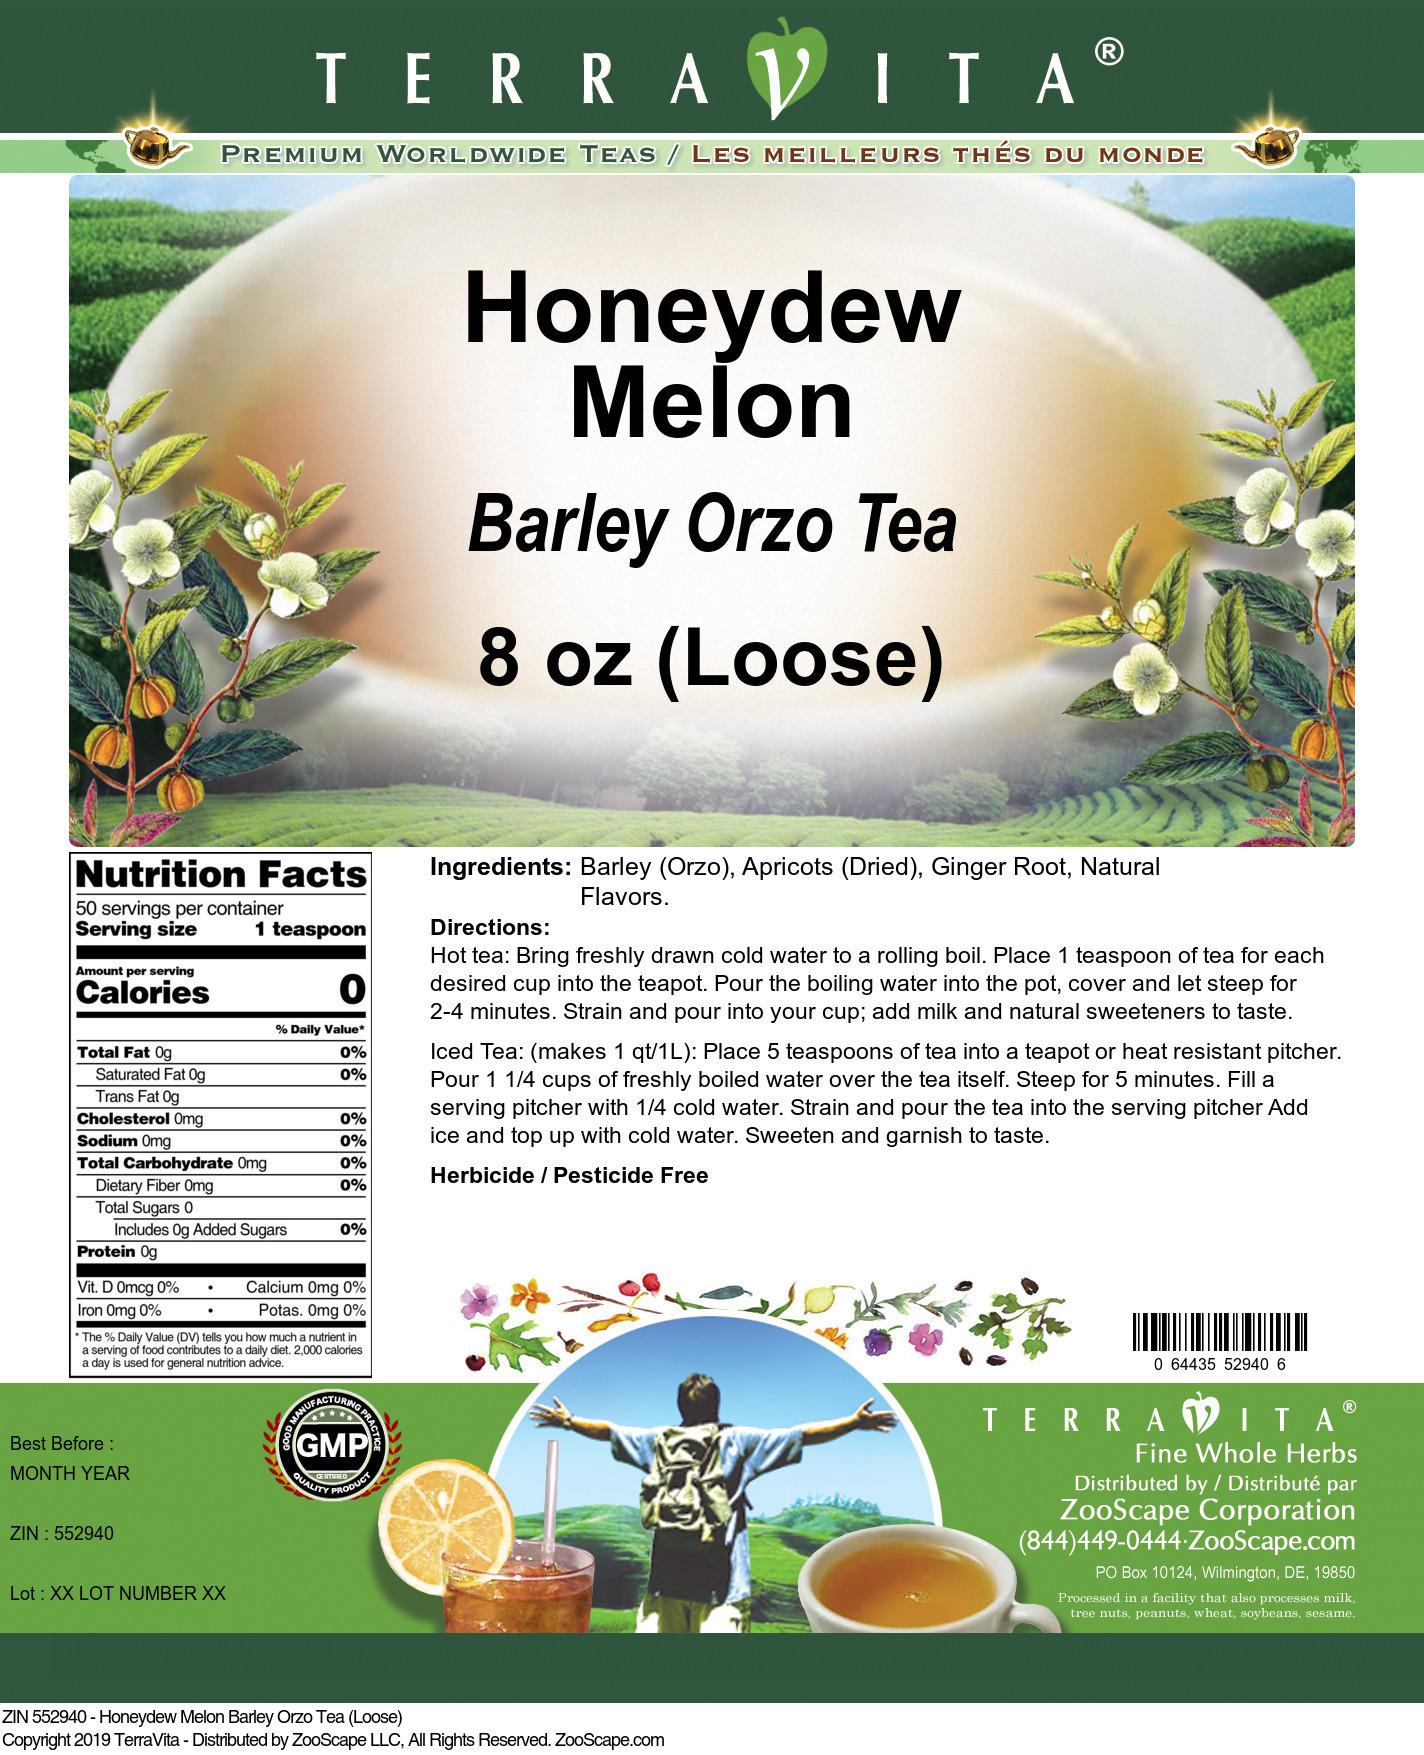 Honeydew Melon Barley Orzo